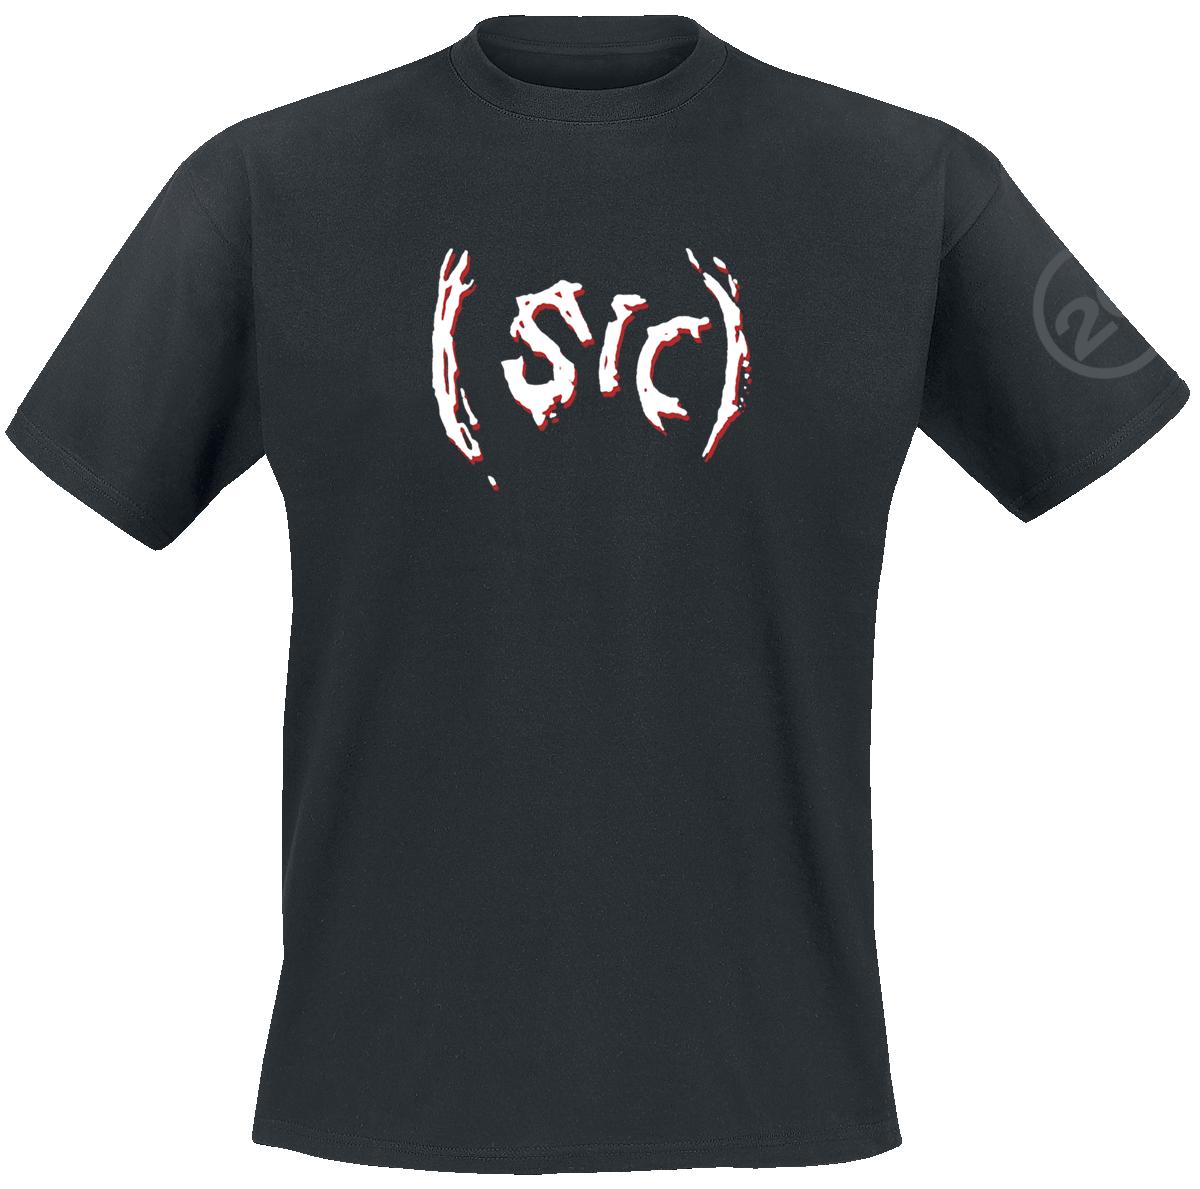 Slipknot - 20th Anniversary (SIC) - T-Shirt - black image